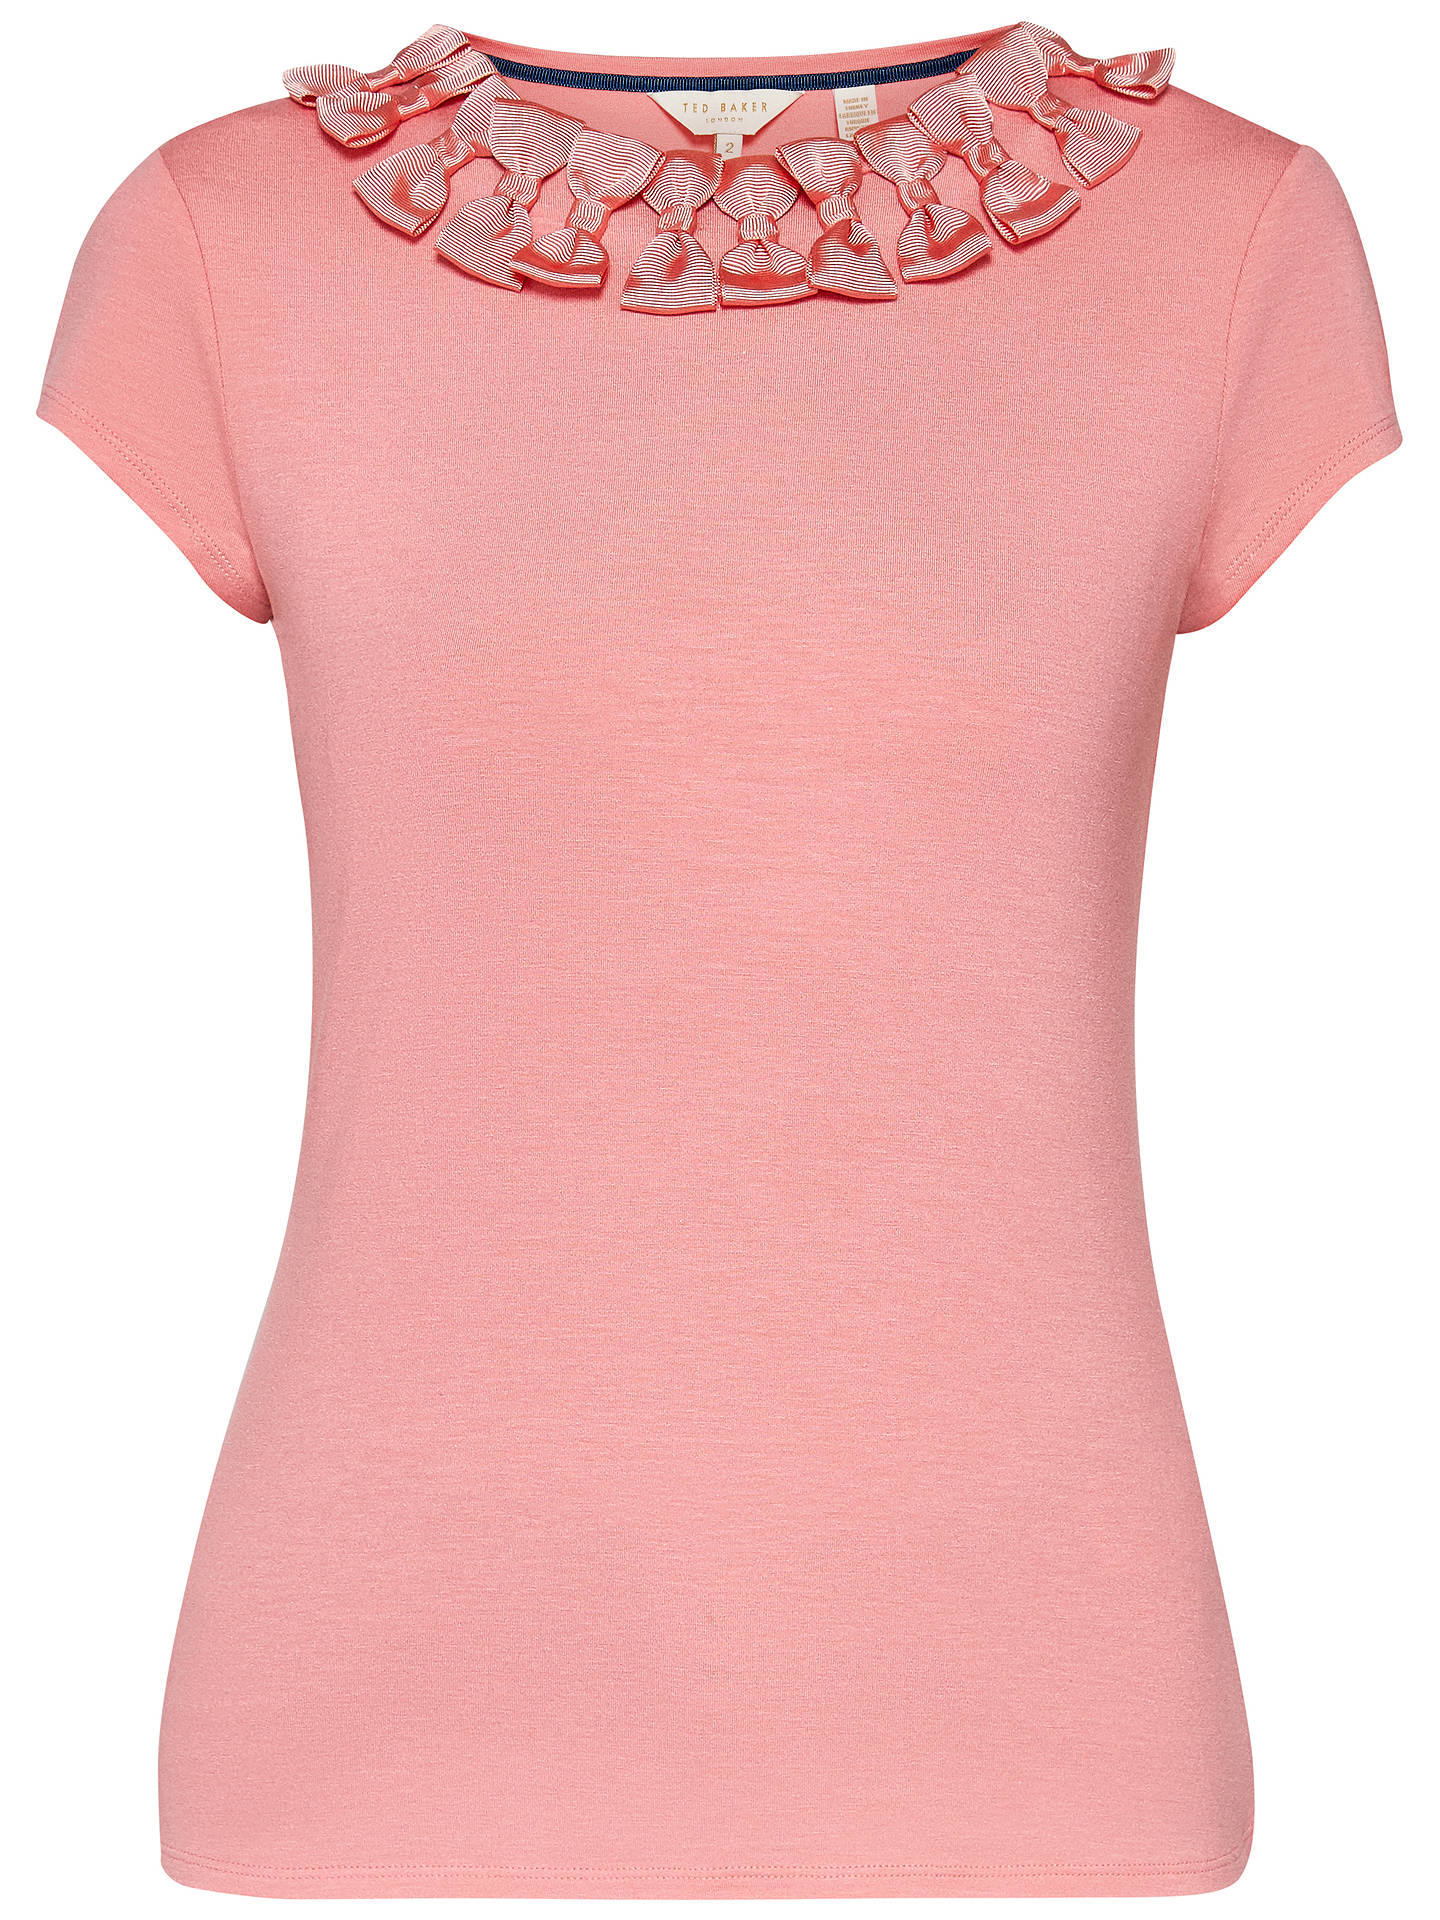 b8d33c0b3 ... Buy Ted Baker Charre Bow Trim T-Shirt